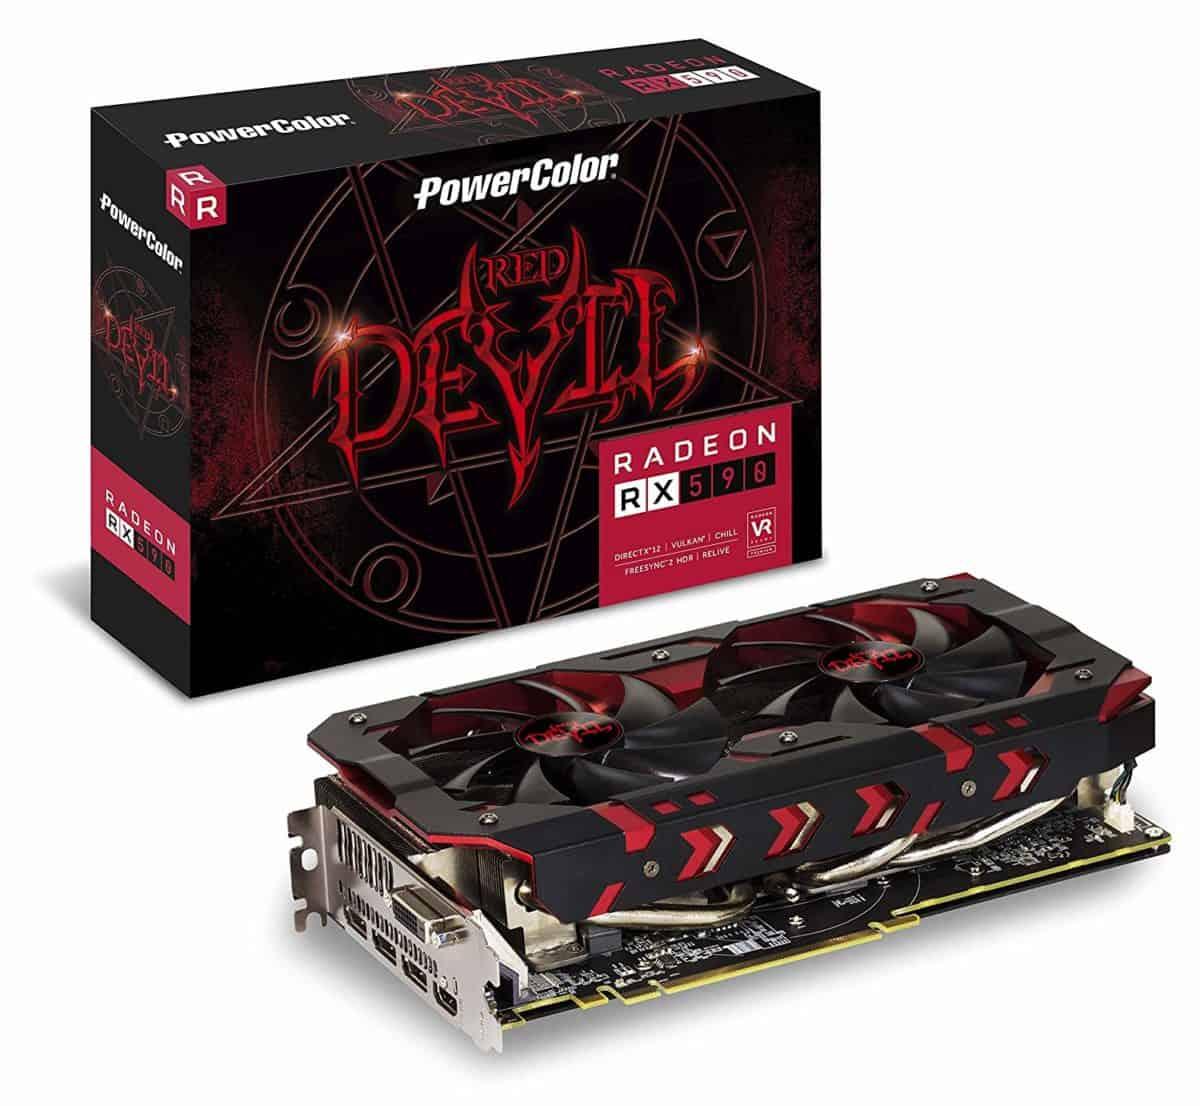 PowerColor Red Devil Radeon™ RX 590 8GB GDDR5